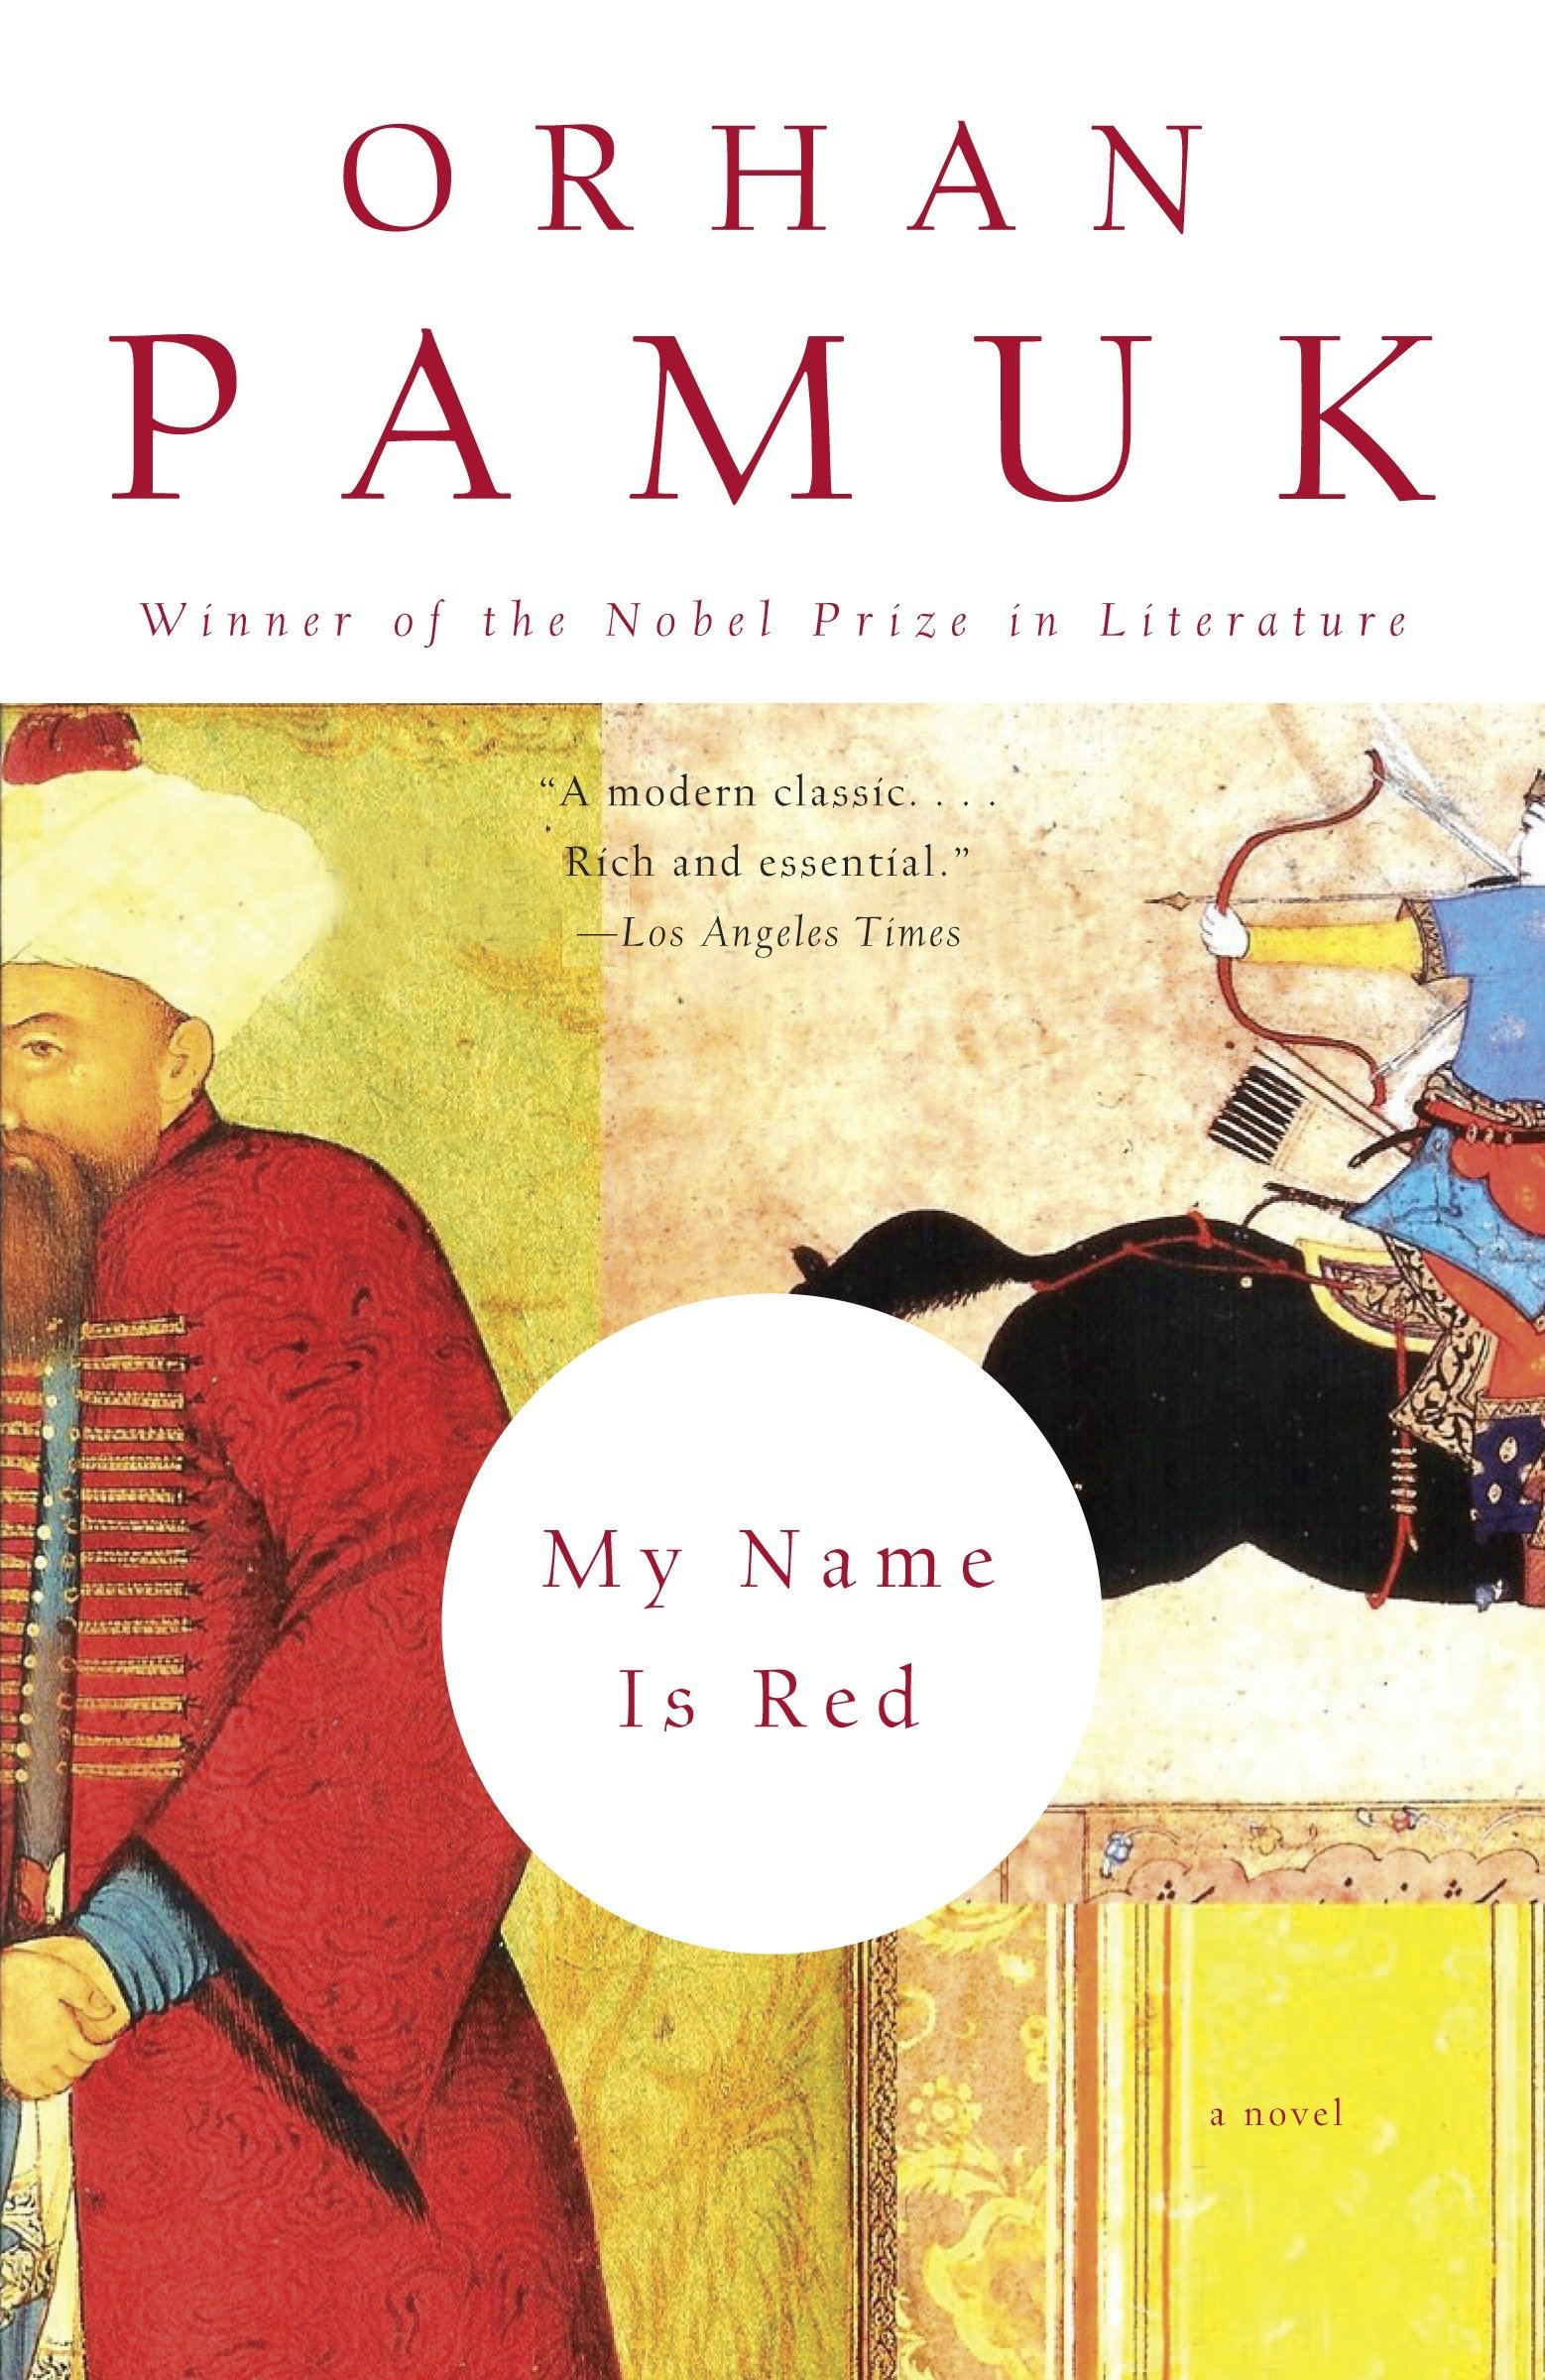 My Name Is Red: Orhan Pamuk, Erdag Göknar: 9780375706851